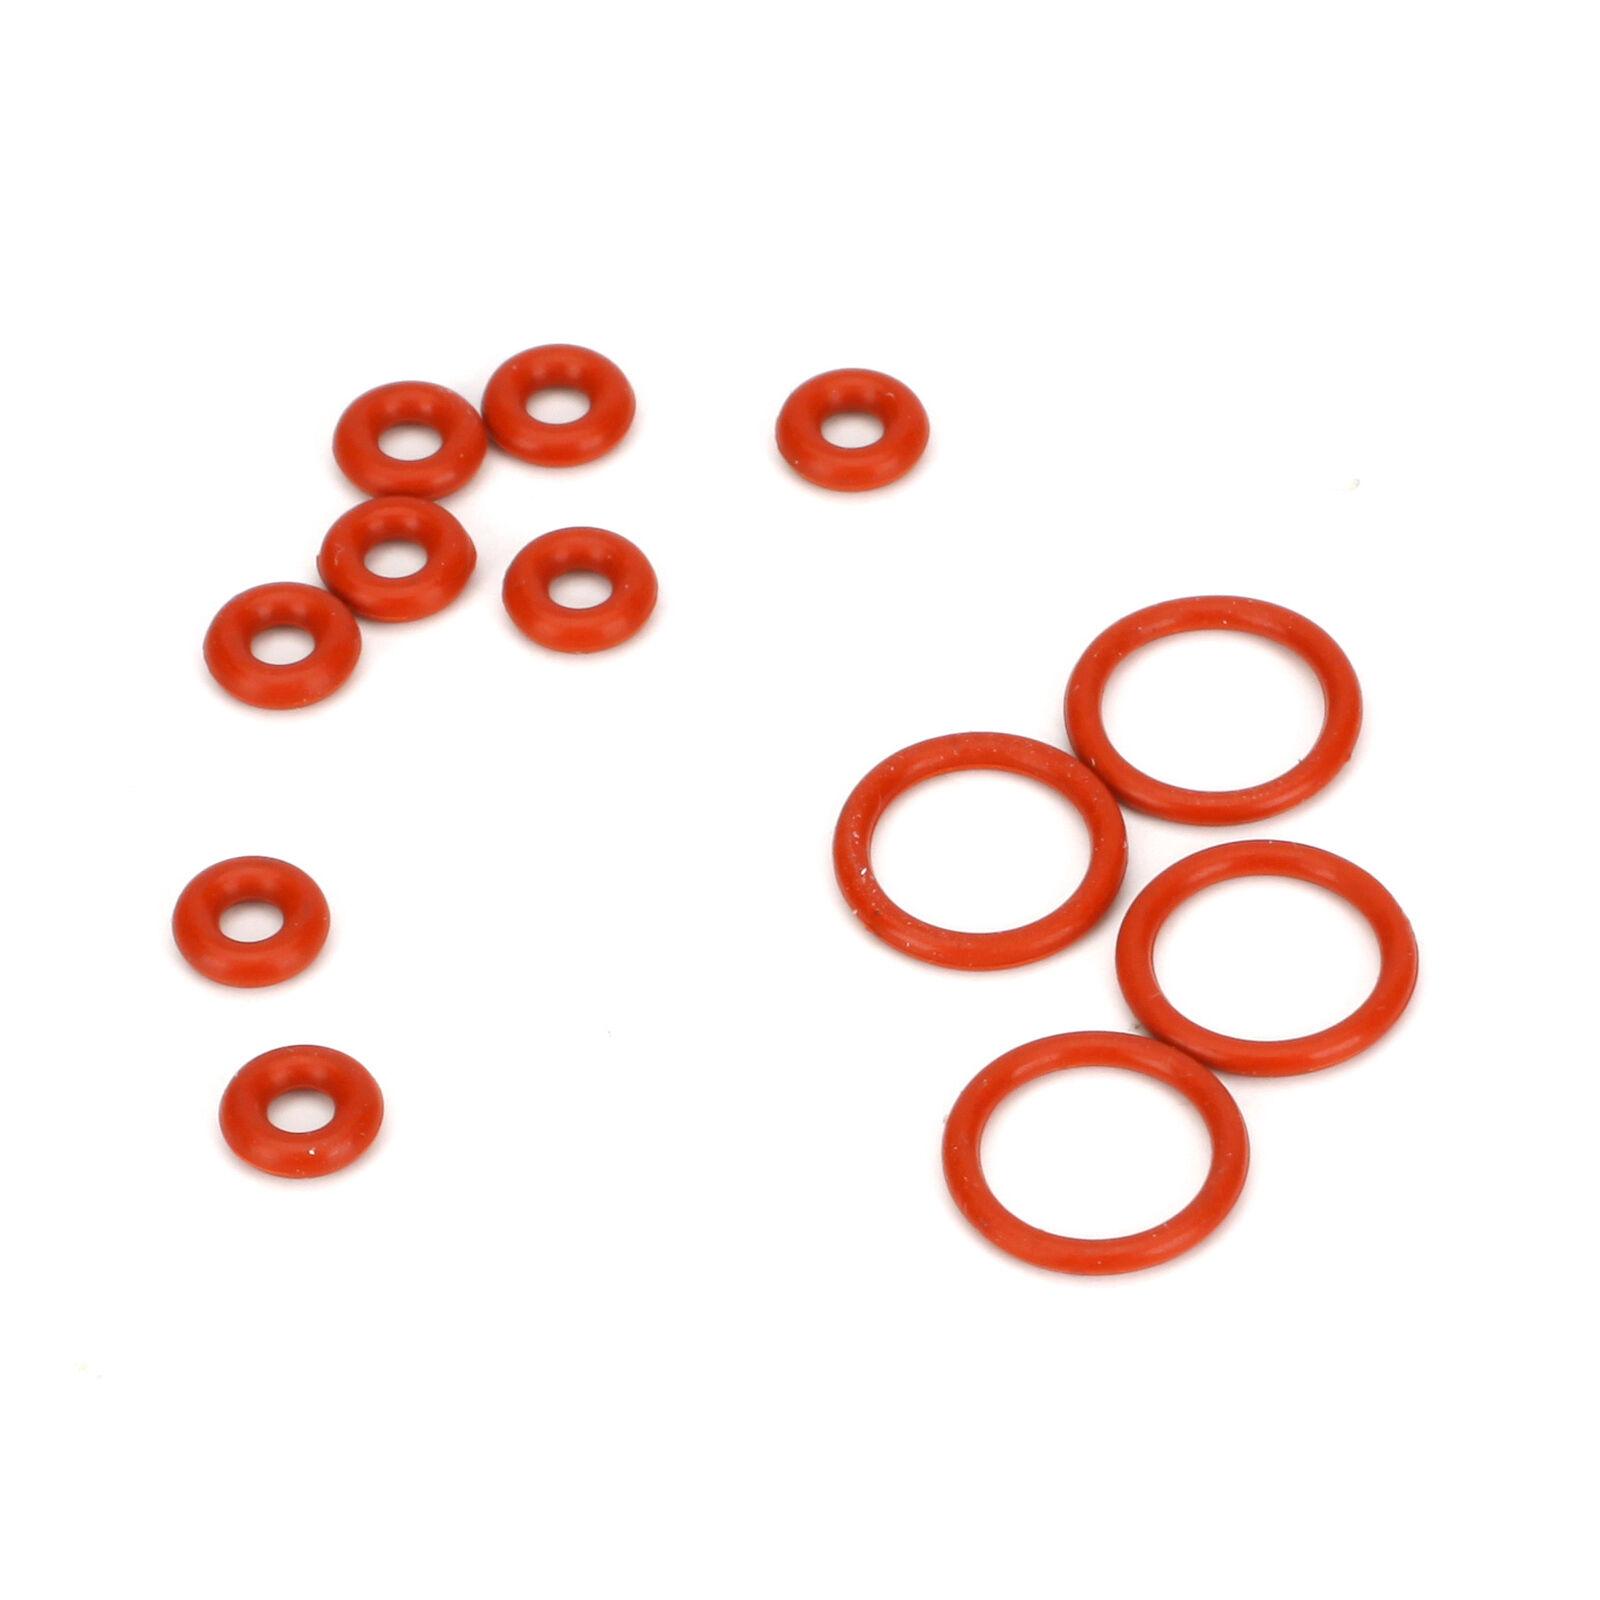 Shock O-Ring Set: All ECX 1/10 2WD